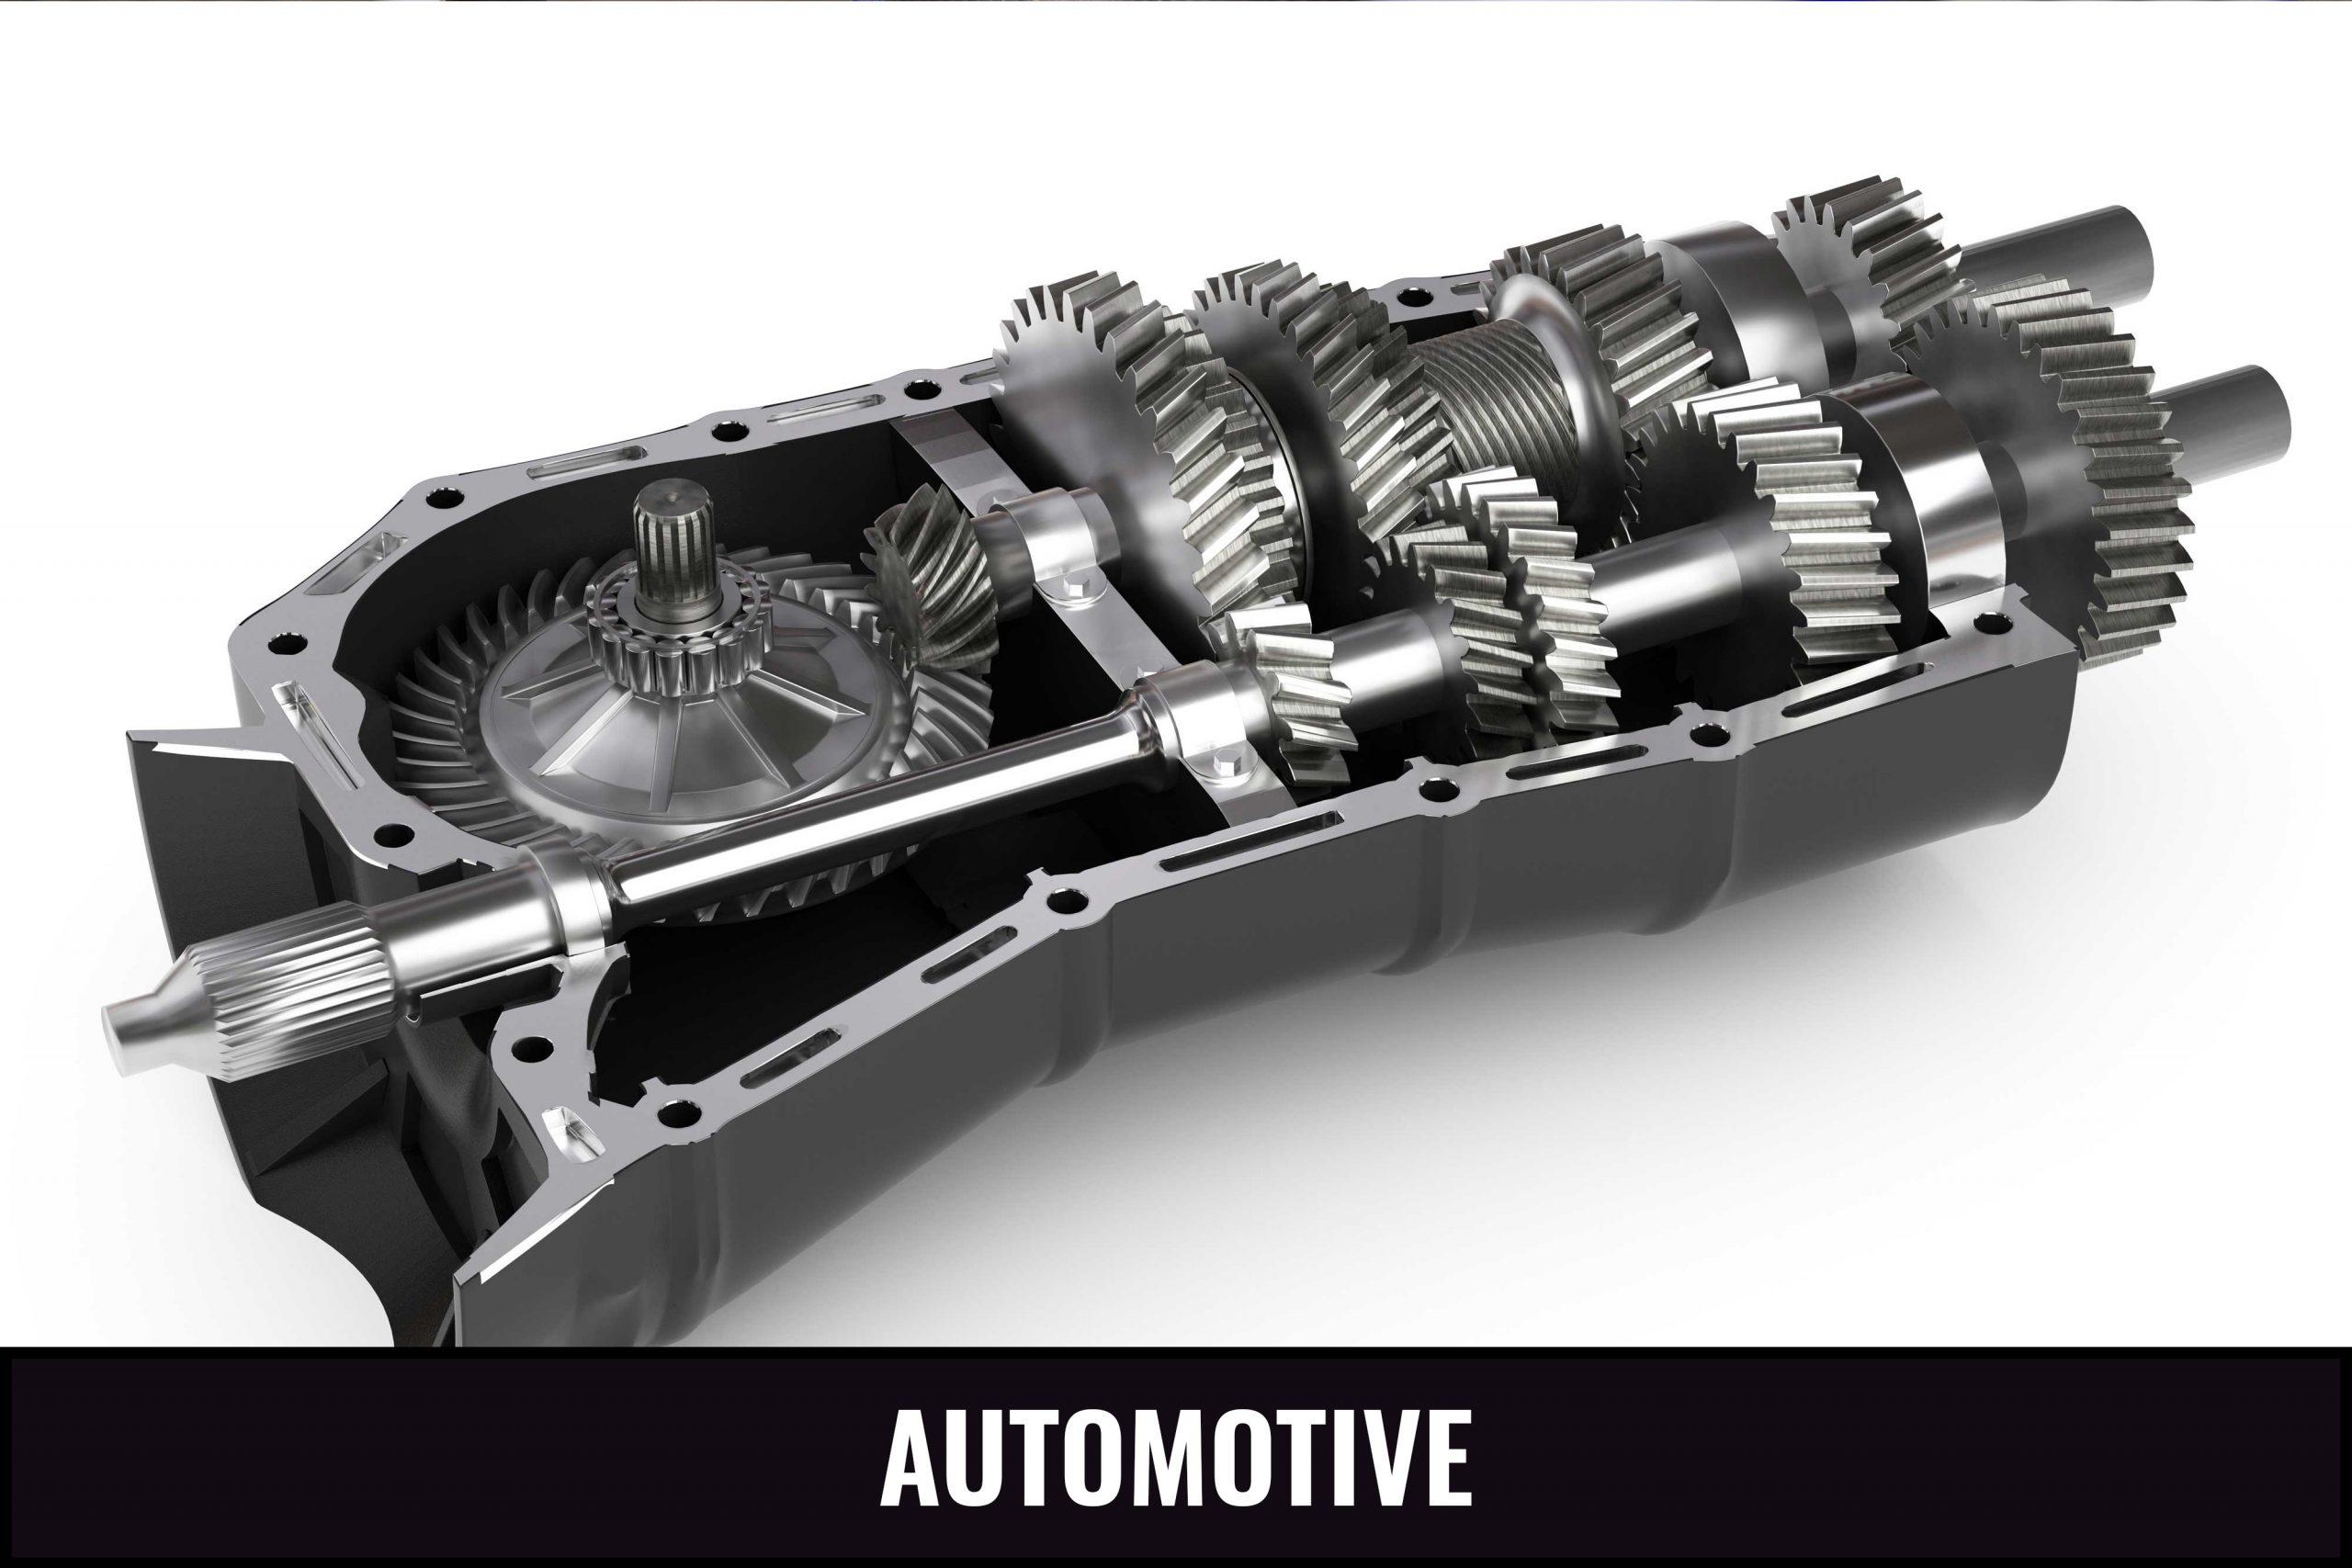 3D illustration of automotive gears.